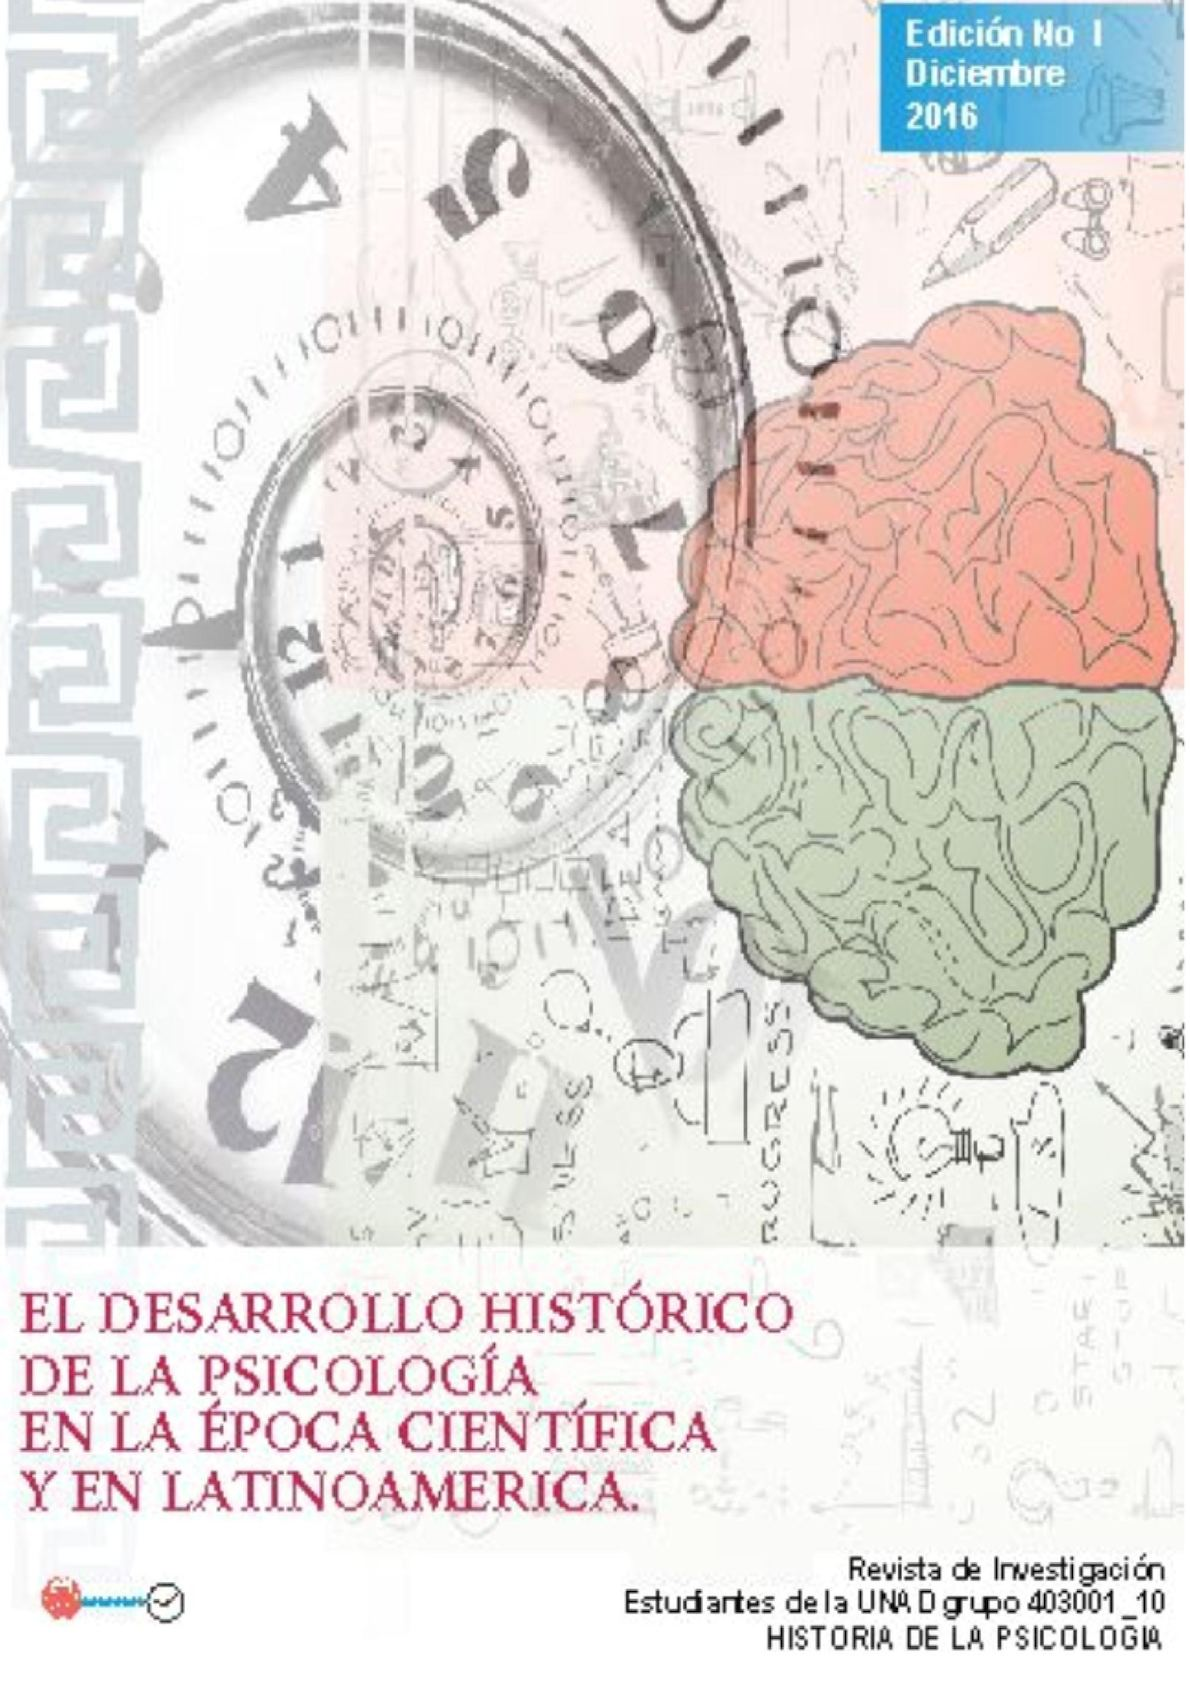 Historia De La Psicologia Revista Trabajo Final Dic 4 2016